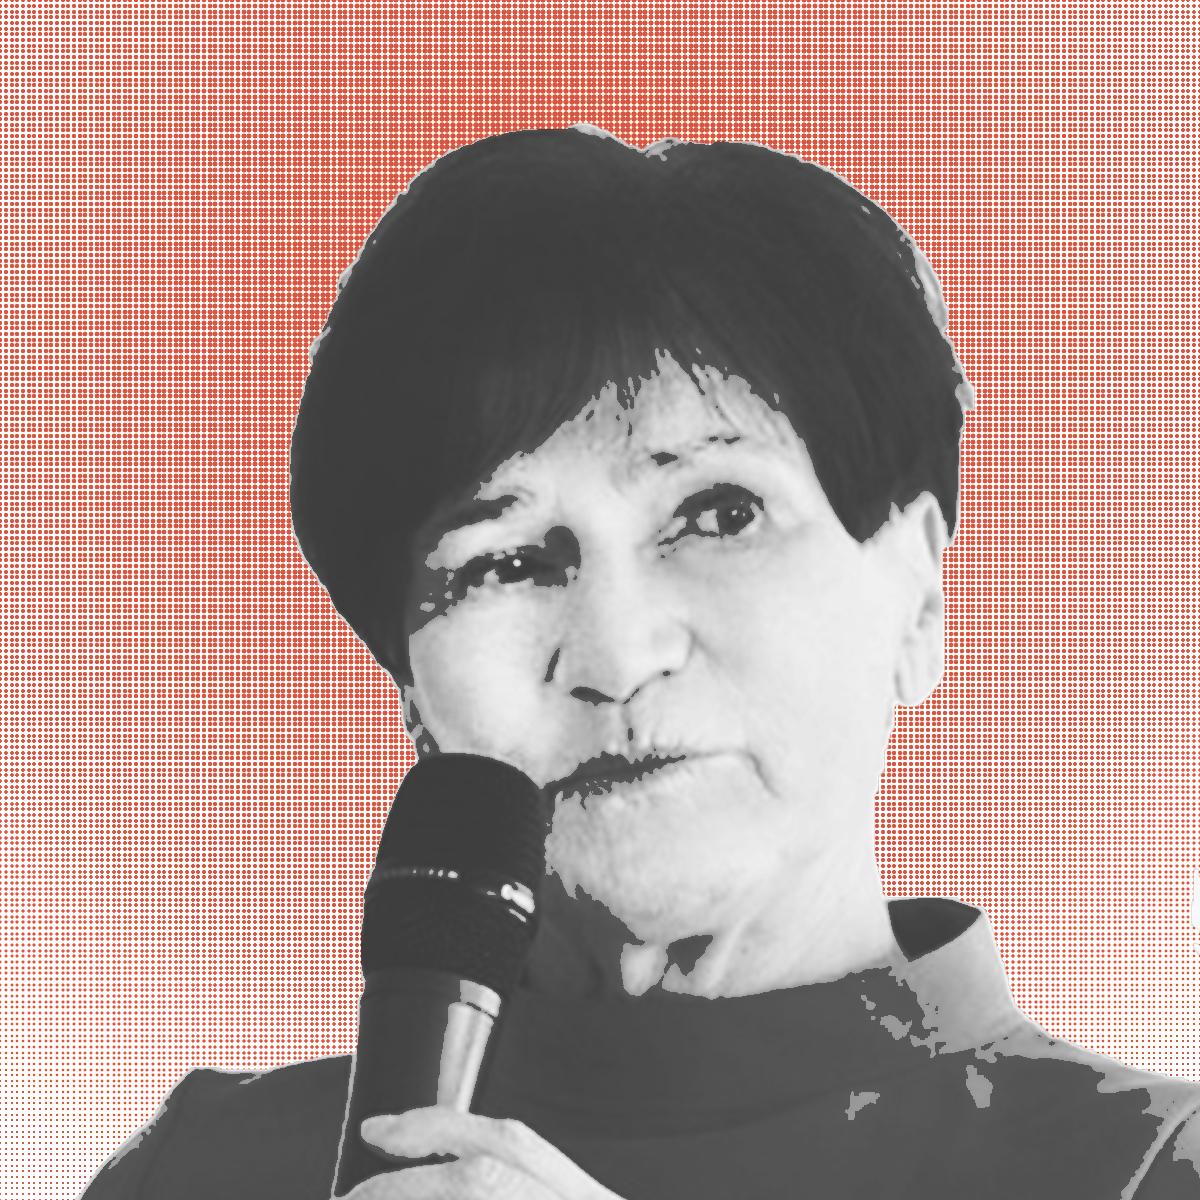 Anna Wolff-Powęska